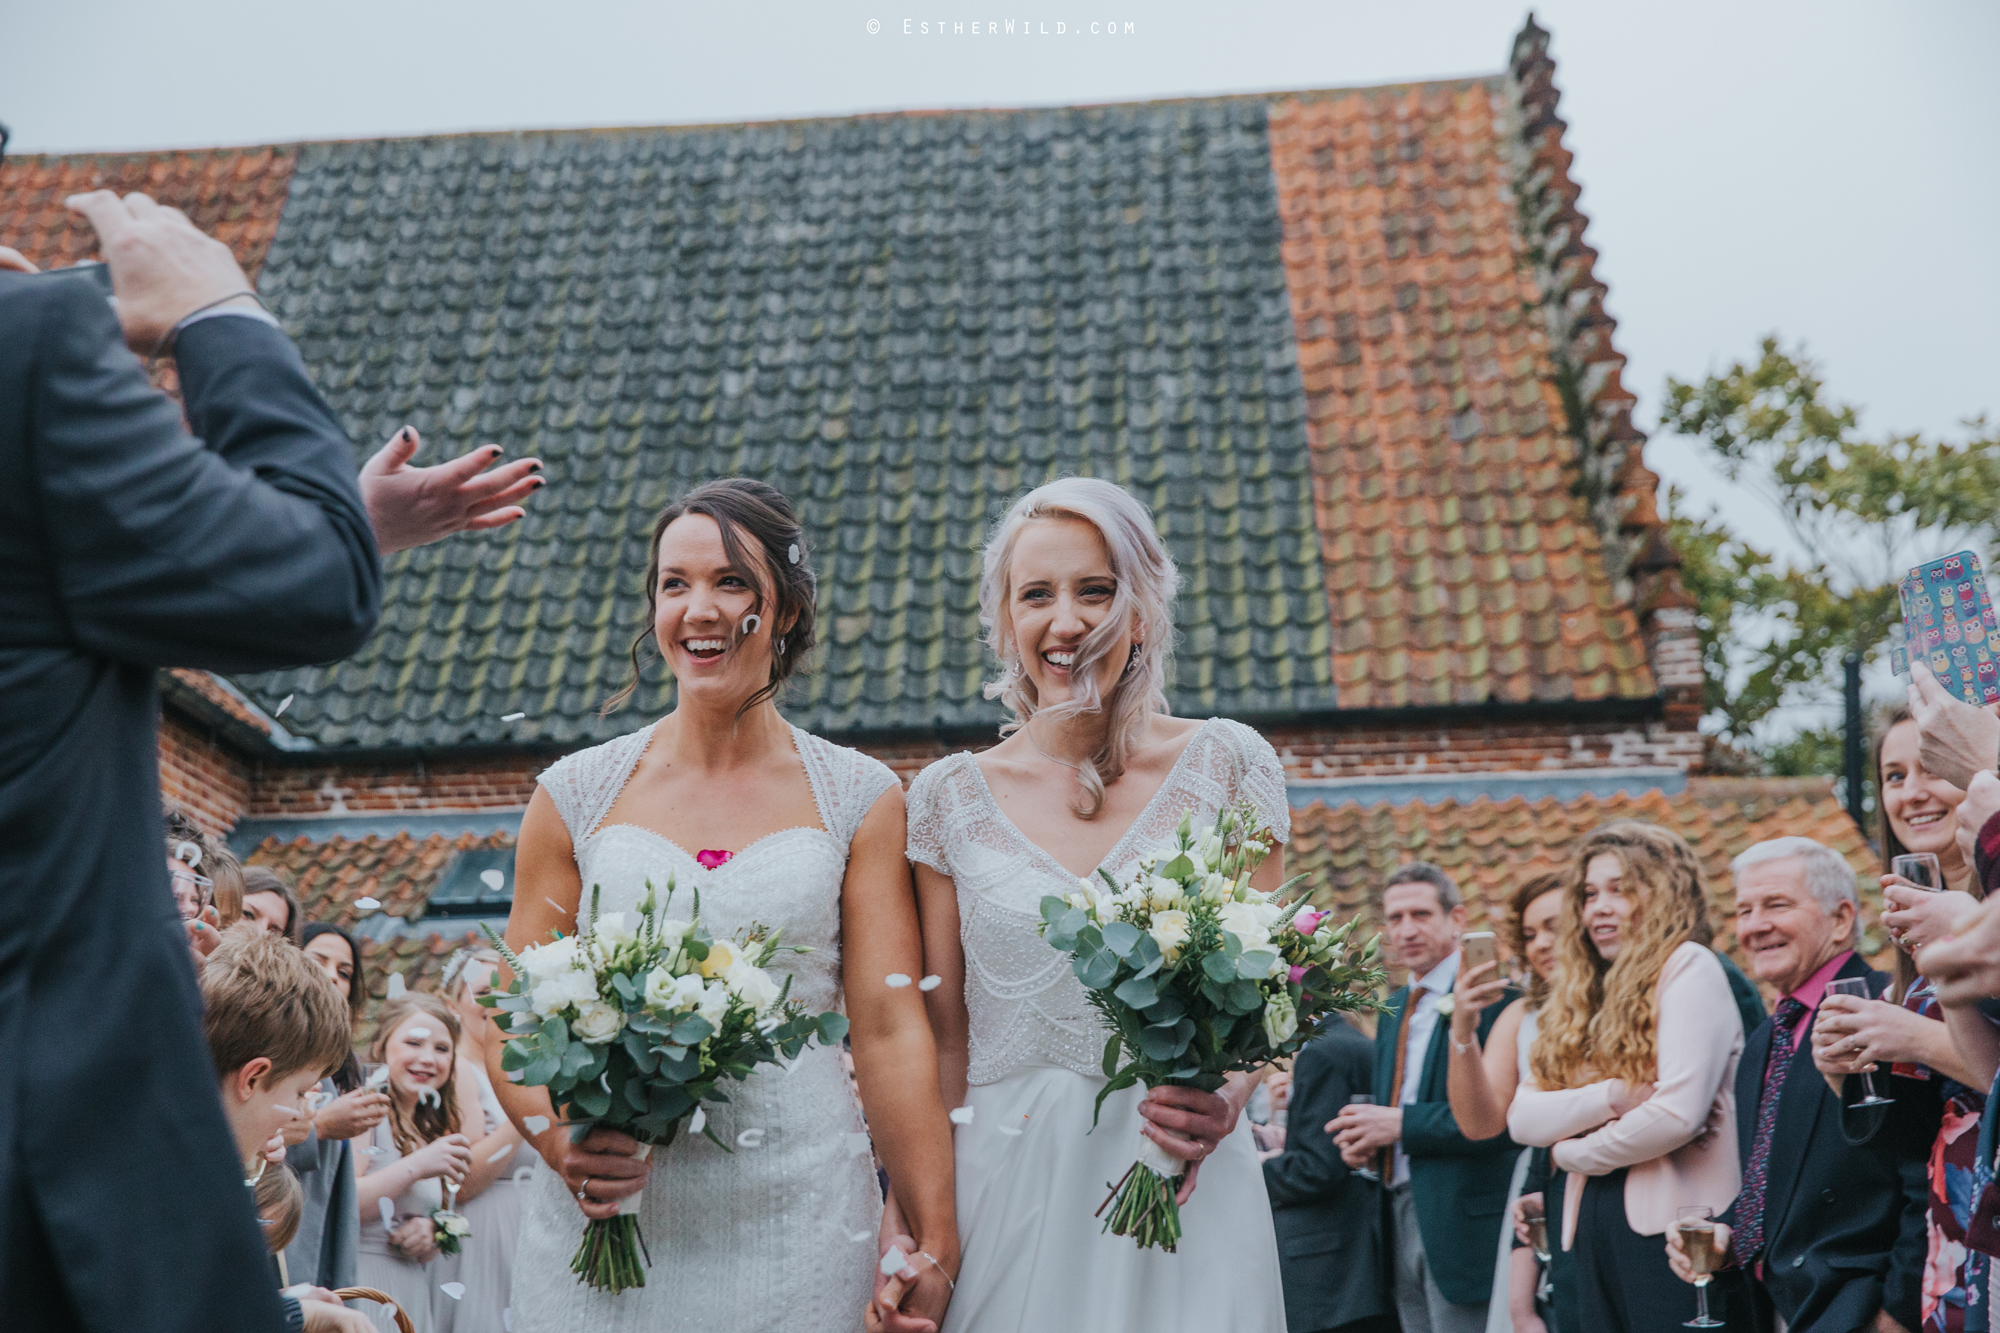 Elms_Barn_Weddings_Suffolk_Photographer_Copyright_Esther_Wild_IMG_1487.jpg